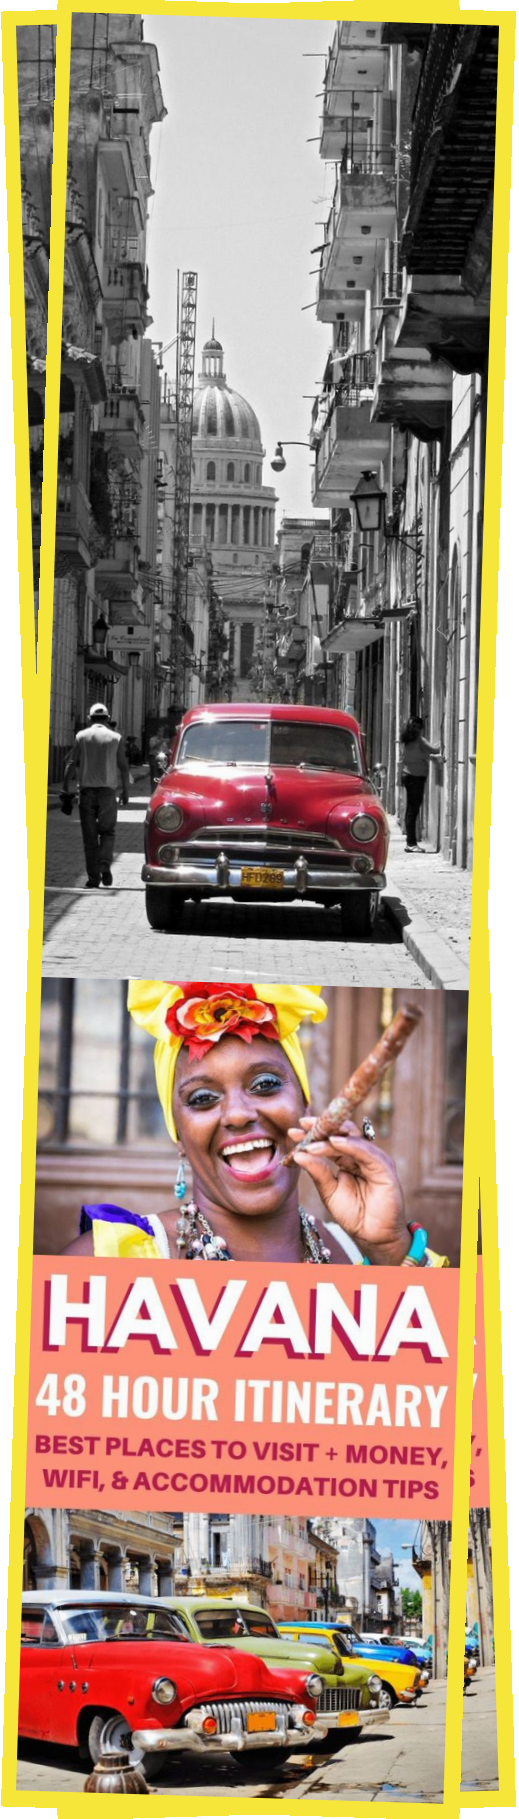 Capitol building and car in Havana, Cuba Vieja Photo by Nomadita on Flickr  Cuba Travel Destinations | Cuba Honeymoon | Cuba Backpacking | Cuba Vacation North America #travel #honeymoon #vacation #backpacking #budgettravel #offthebeatenpath #bucketlist #wanderlust #Cuba #NorthAmerica #exploreCuba #visitCuba  #Cuba #Photography #travelforfoodies #ceramictravelmug #airplanetravel #traveladvice #souvenirideastravel #awesometraveldestinations #travelideas #irelandtravelideas #sweedenideas